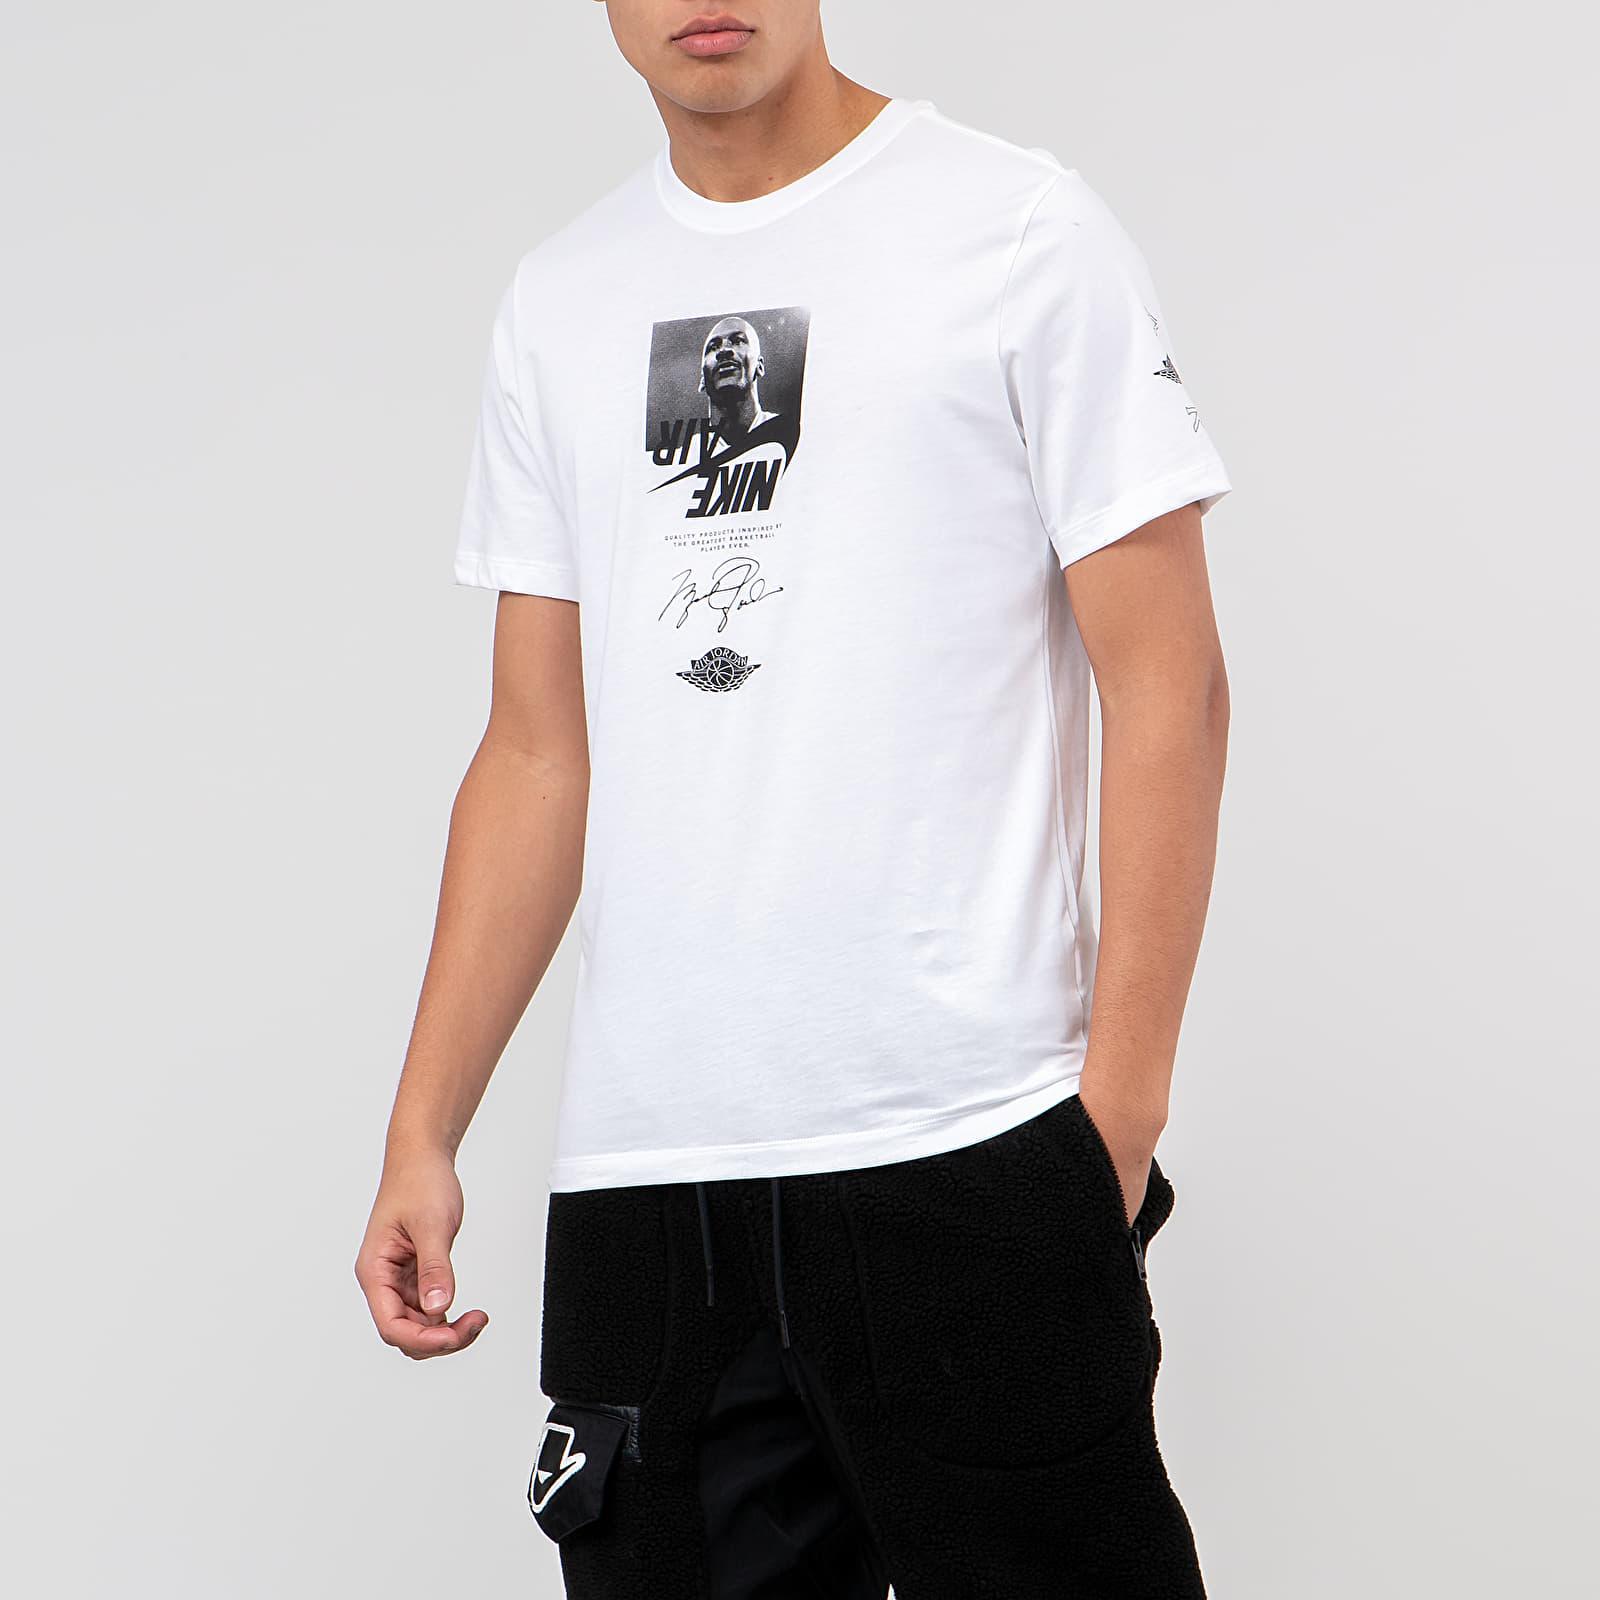 T-Shirts Jordan Ctn The Man Tee White